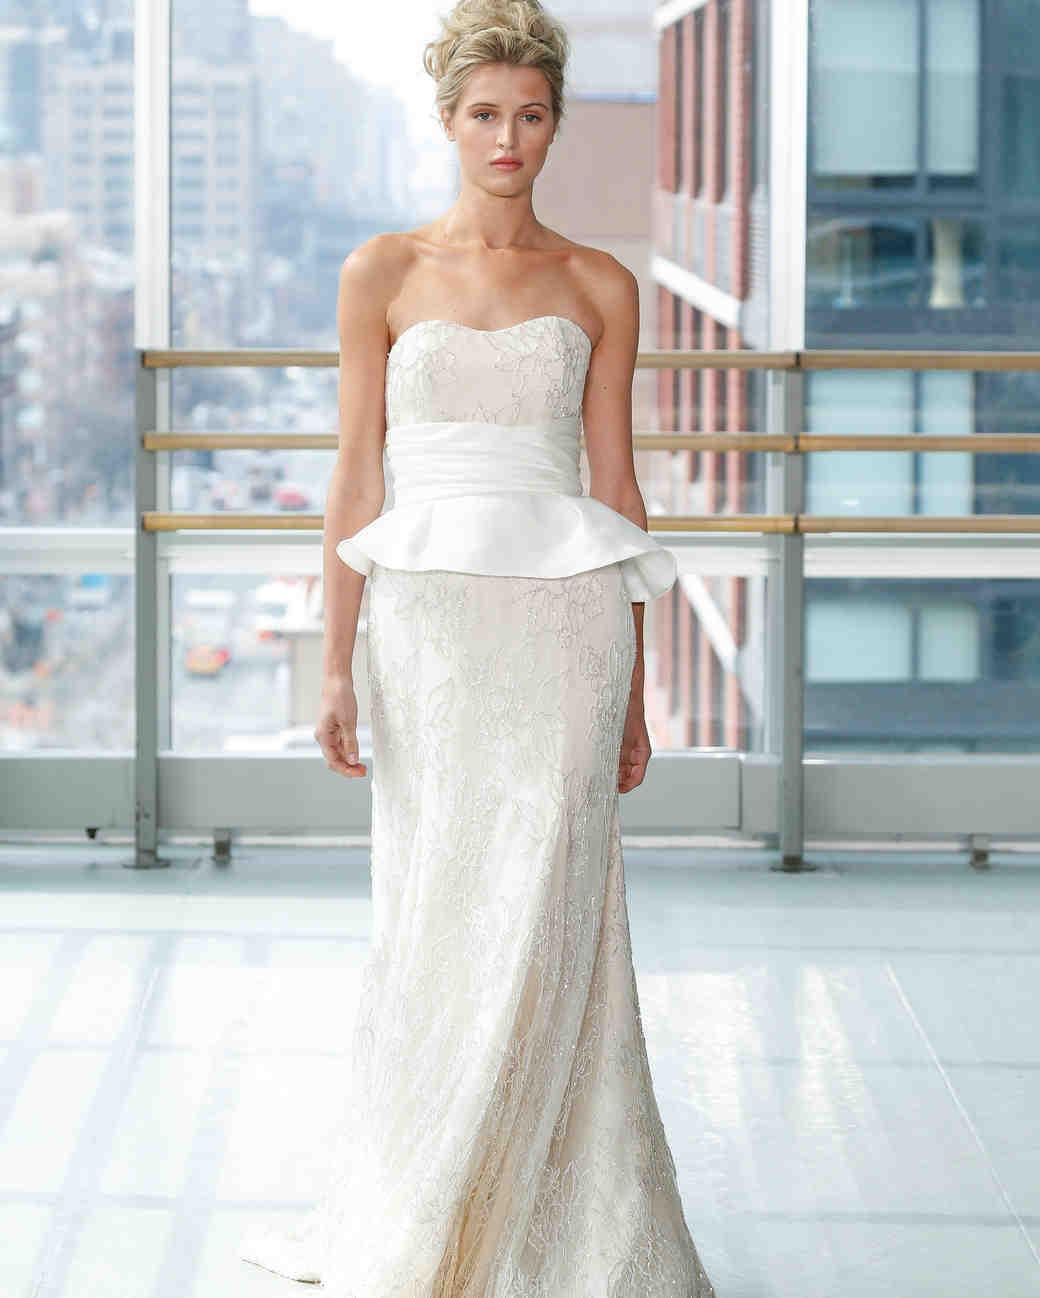 gracy accad wedding dress spring 2019 sweat heart peplum beaded